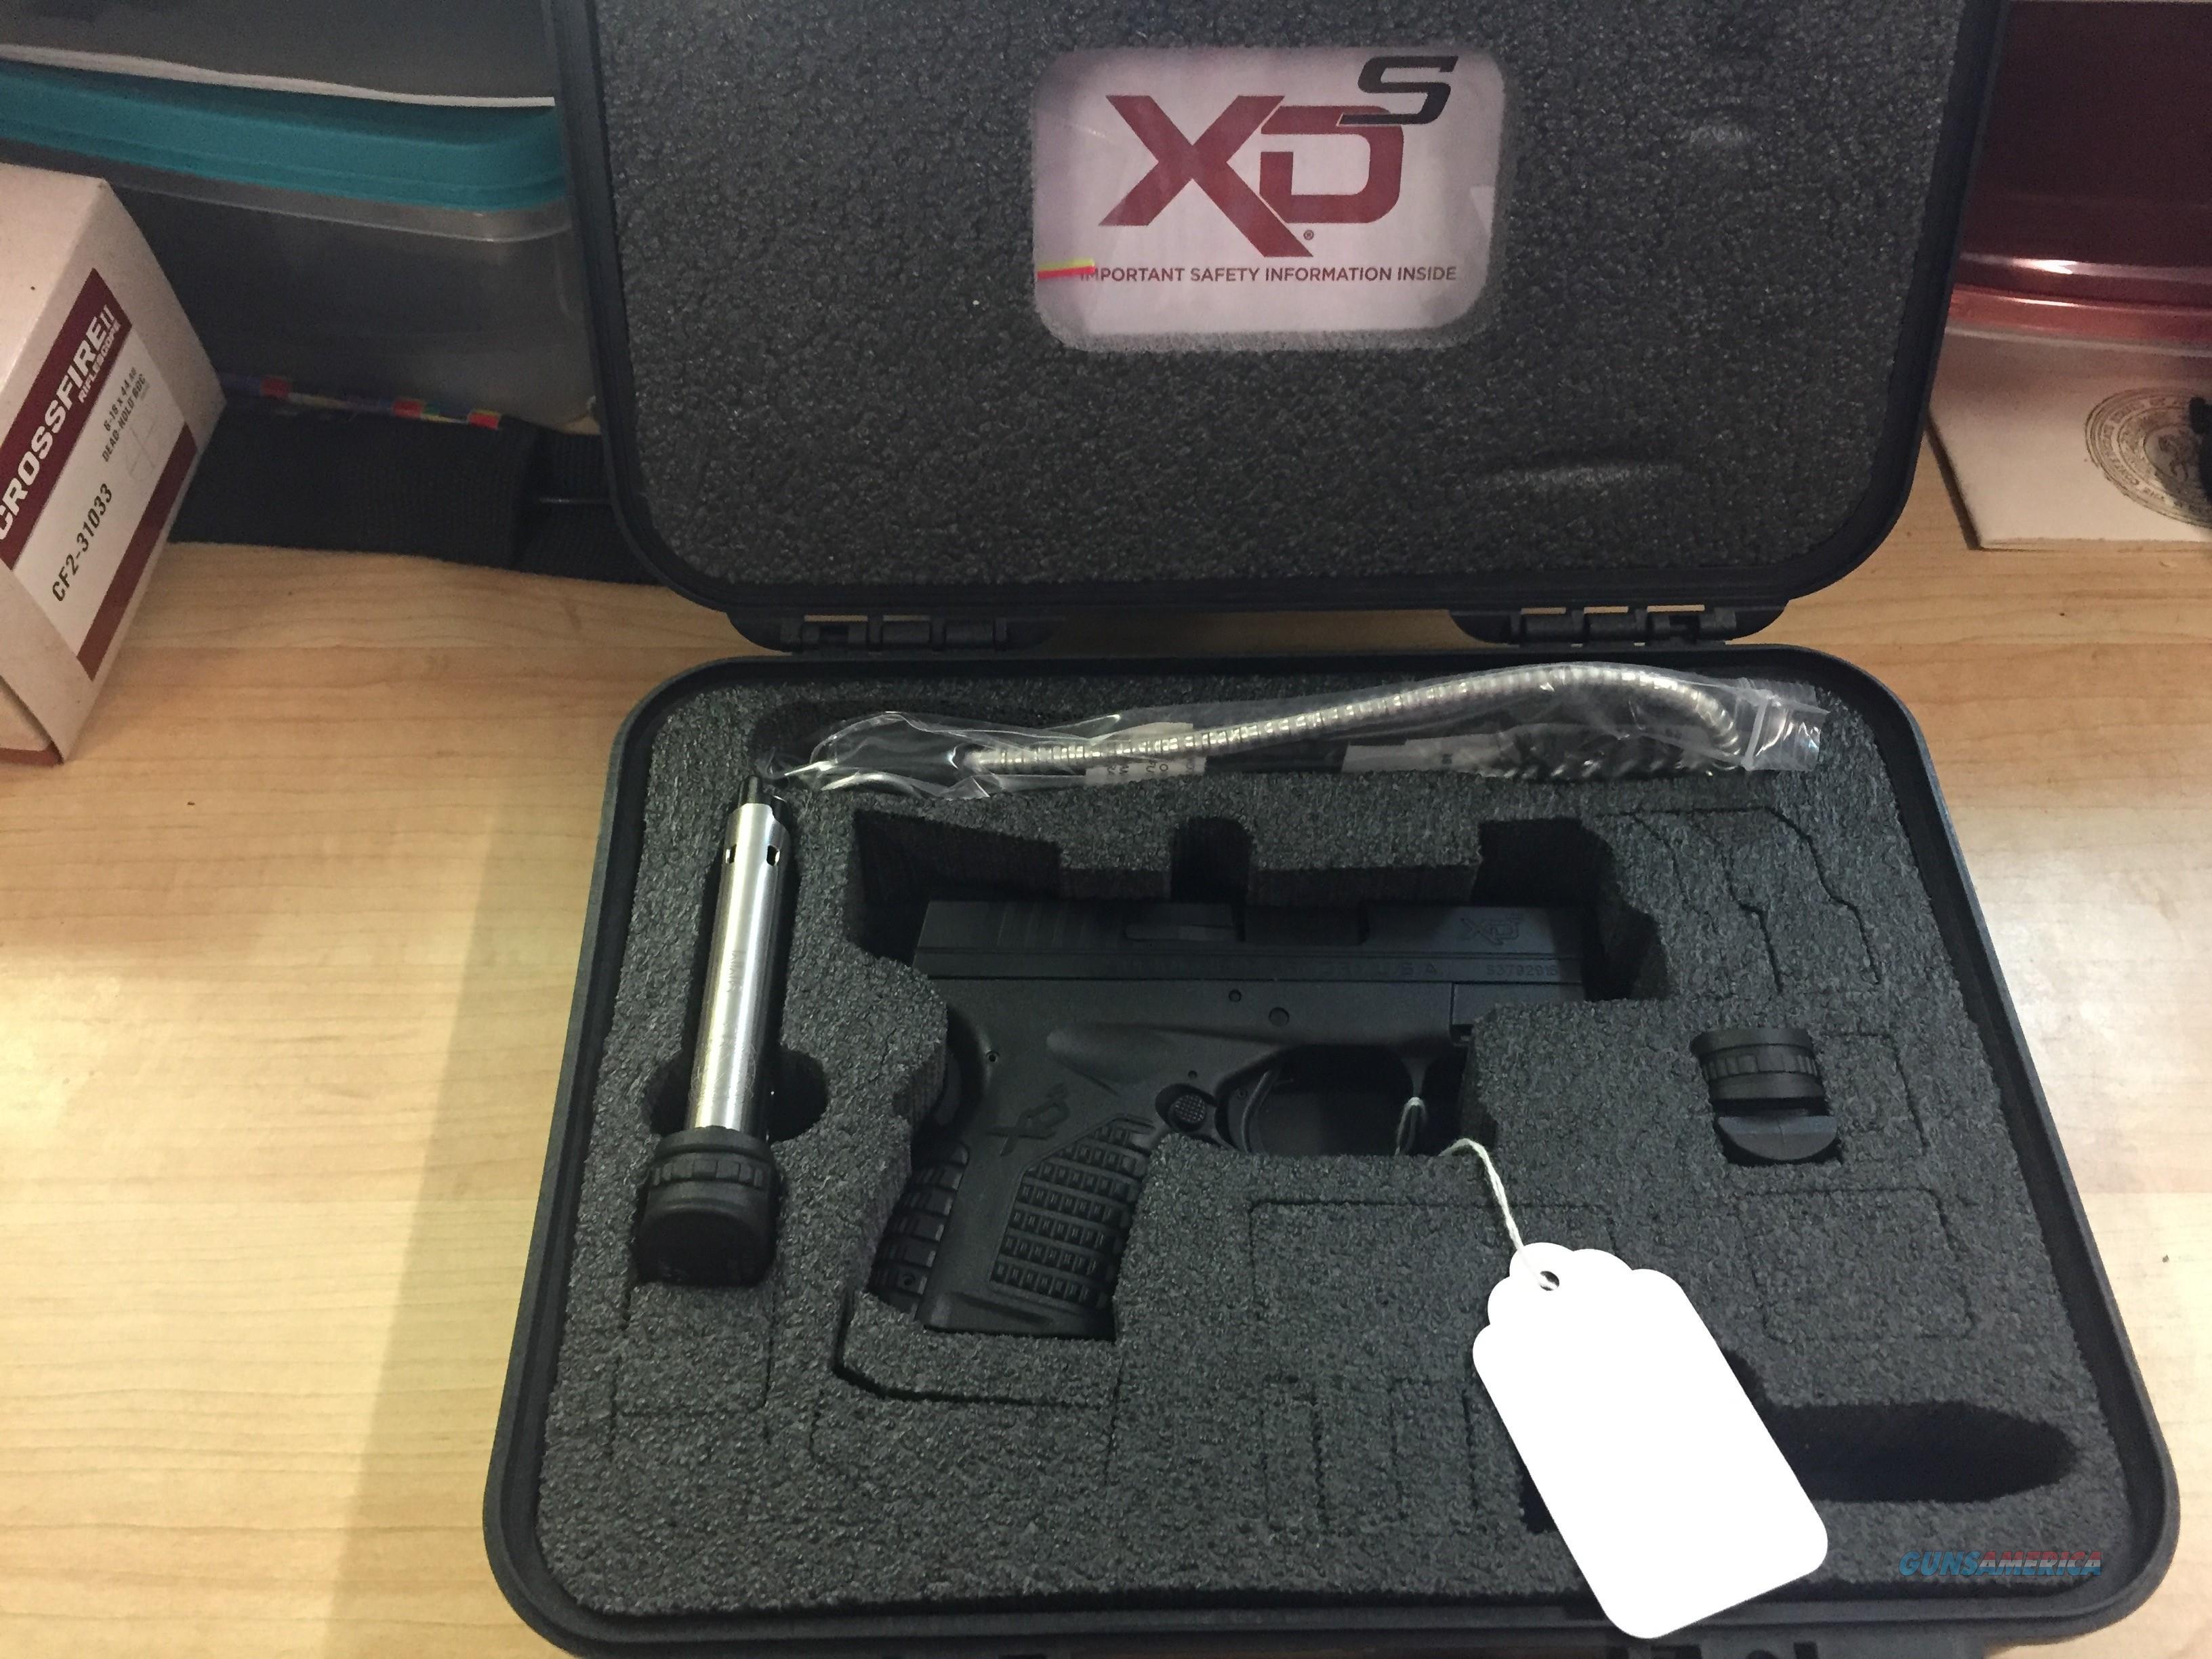 Springfield XDS 9MM DAO PST 3.3B 8R  Guns > Pistols > Springfield Armory Pistols > XD-S